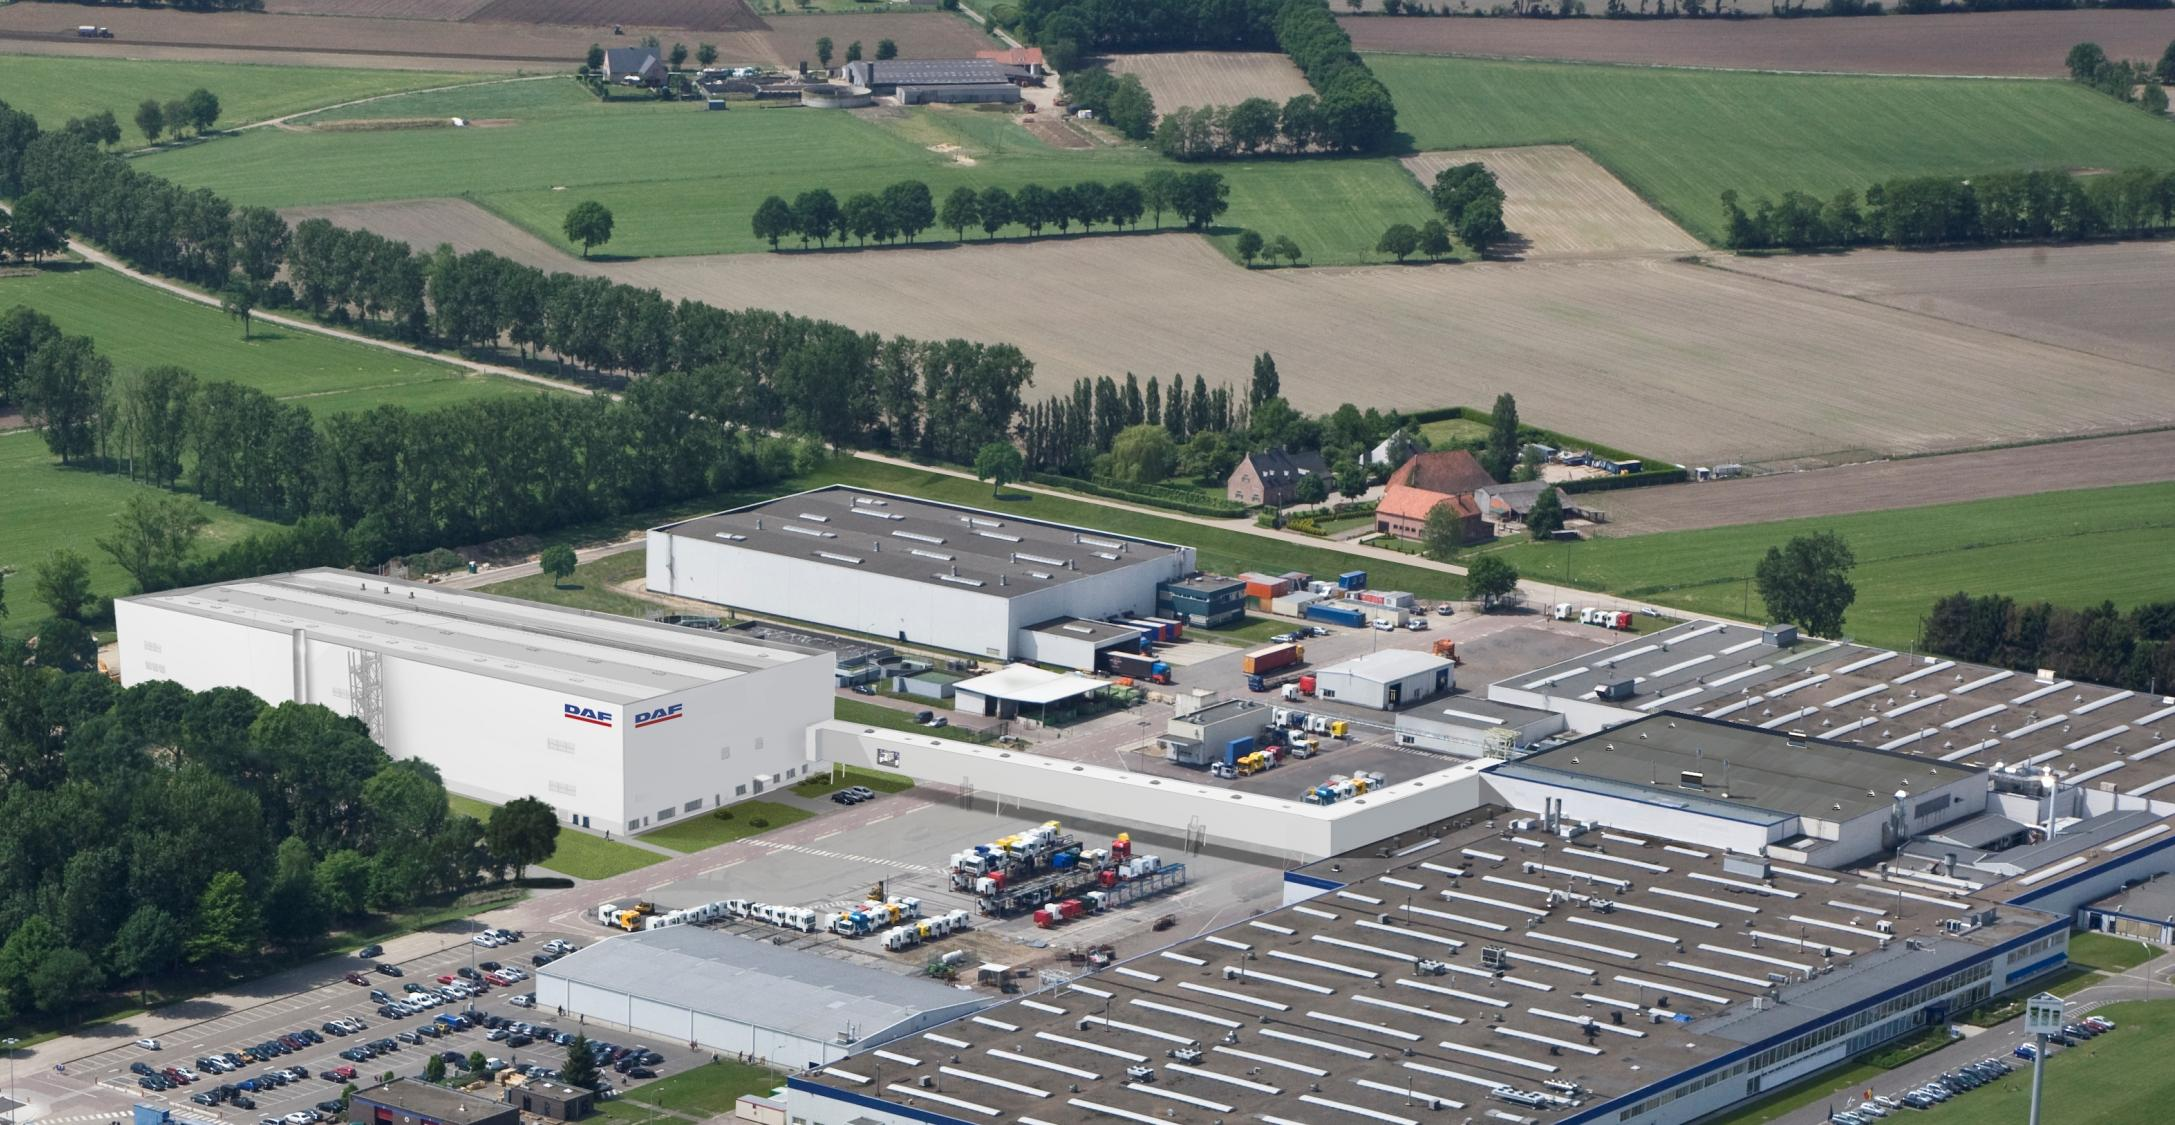 DAF fabriek